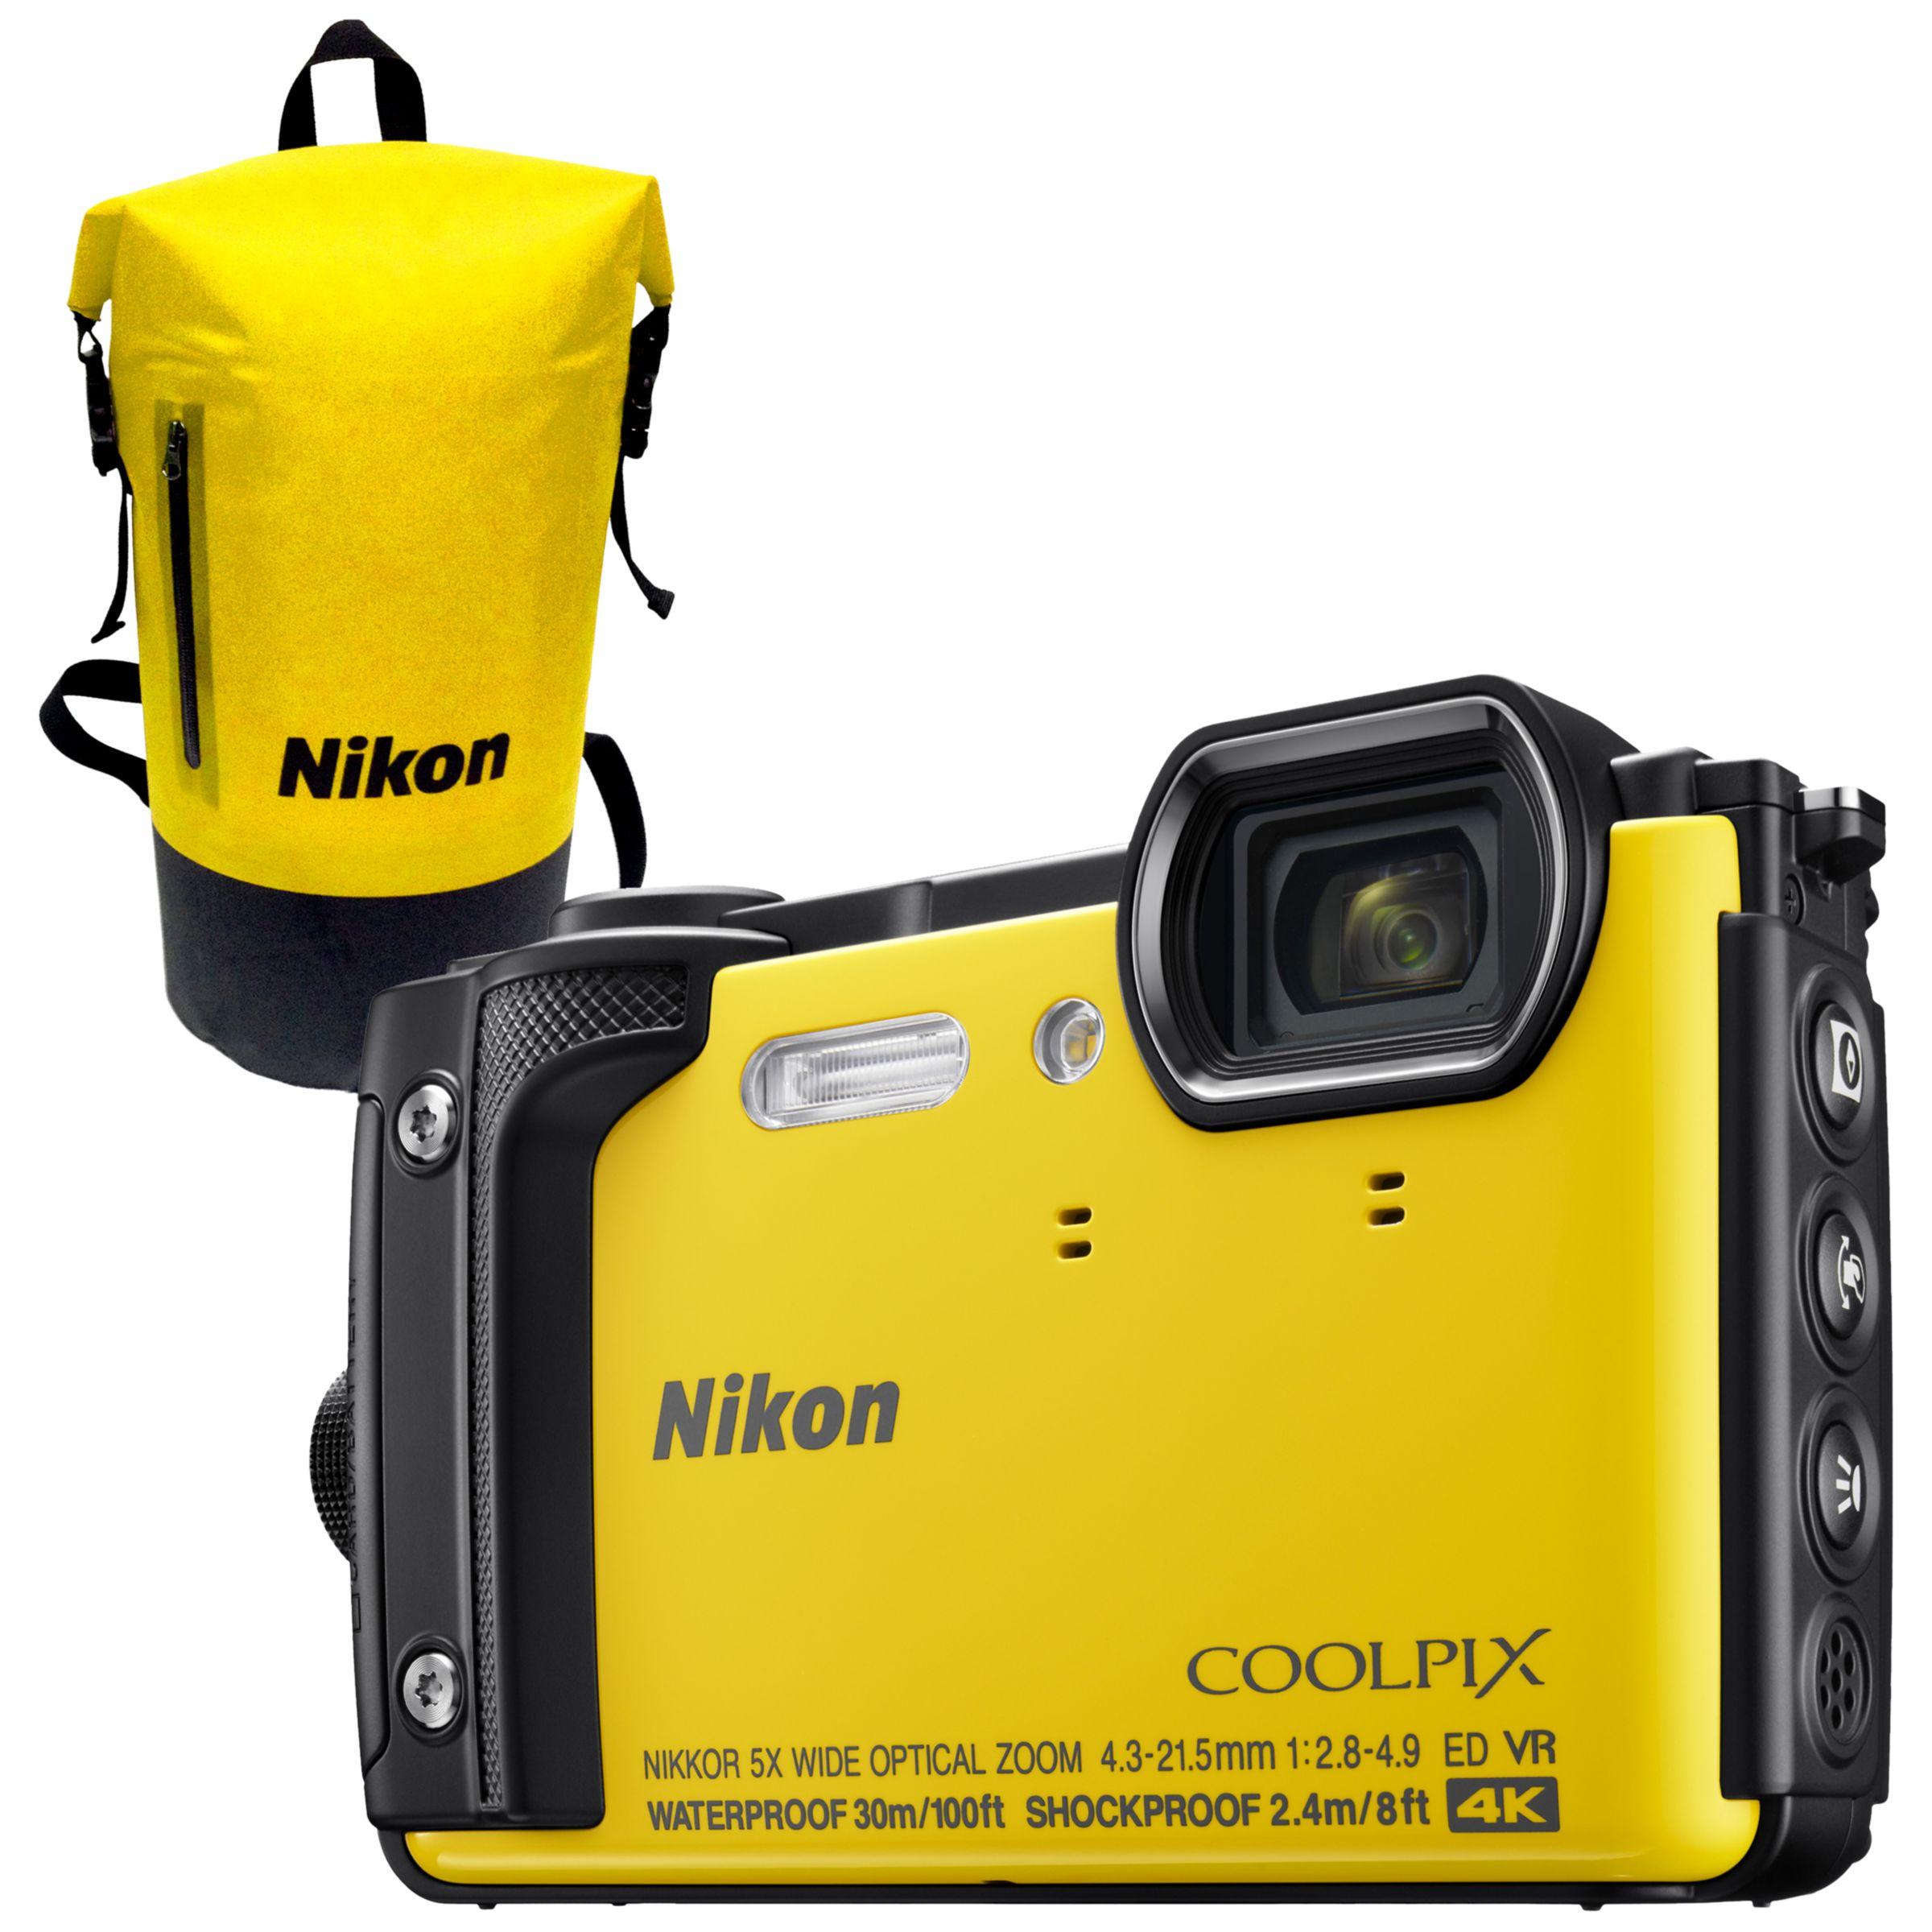 Nikon Nikon COOLPIX W300 GPS Waterproof, Freezeproof, Shockproof, Dustproof Digital Camera, 16MP, 4K UHD, 5x Optical Zoom, Bluetooth, 3 LCD Screen